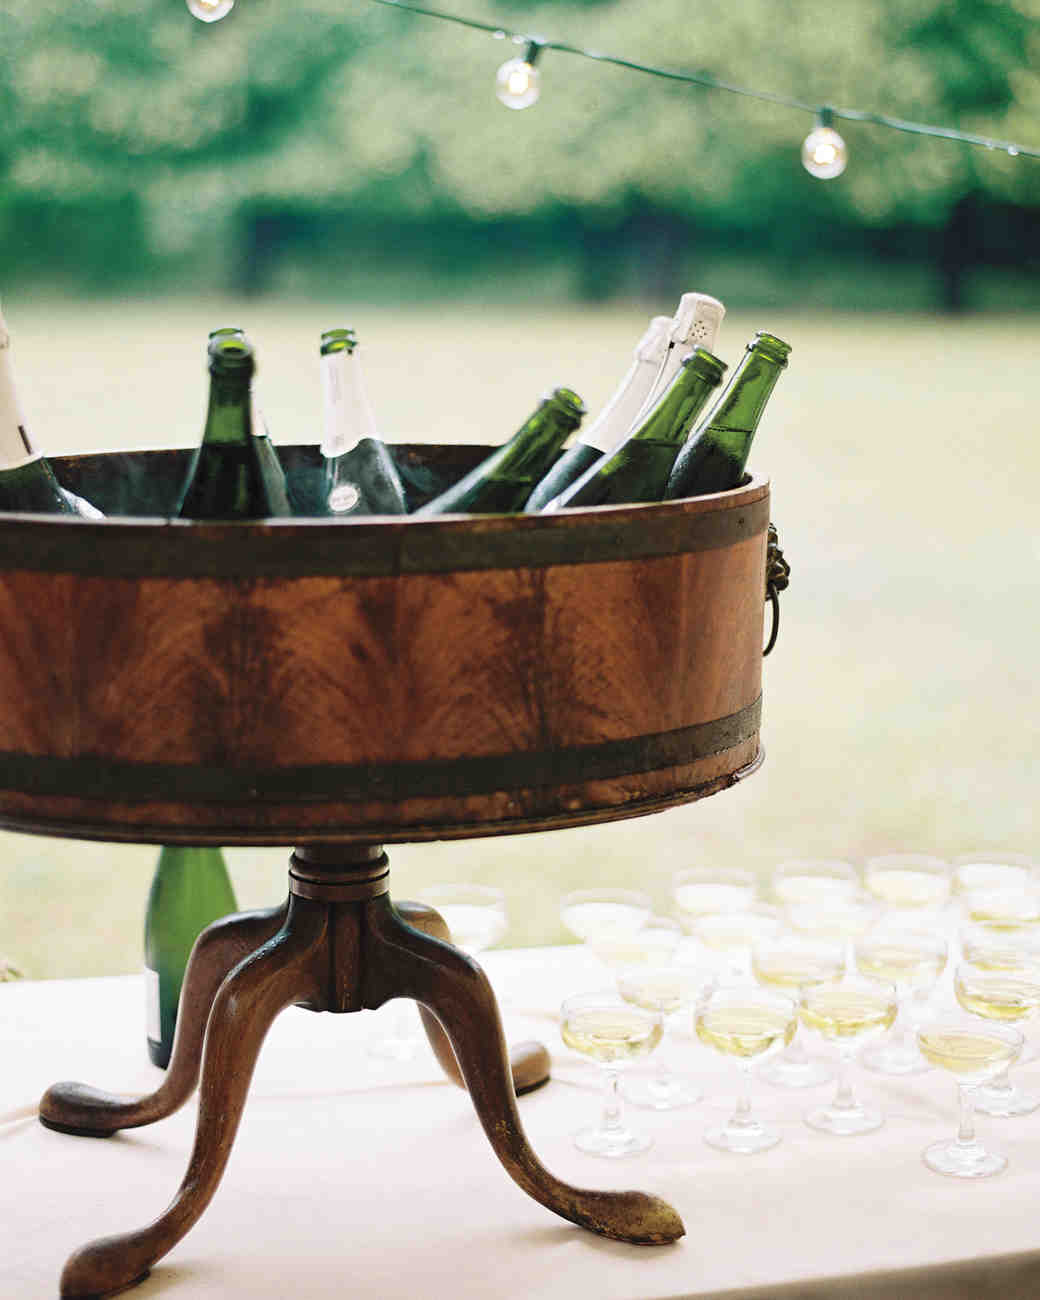 champagne-door-county-wi-048-mwds110744.jpg